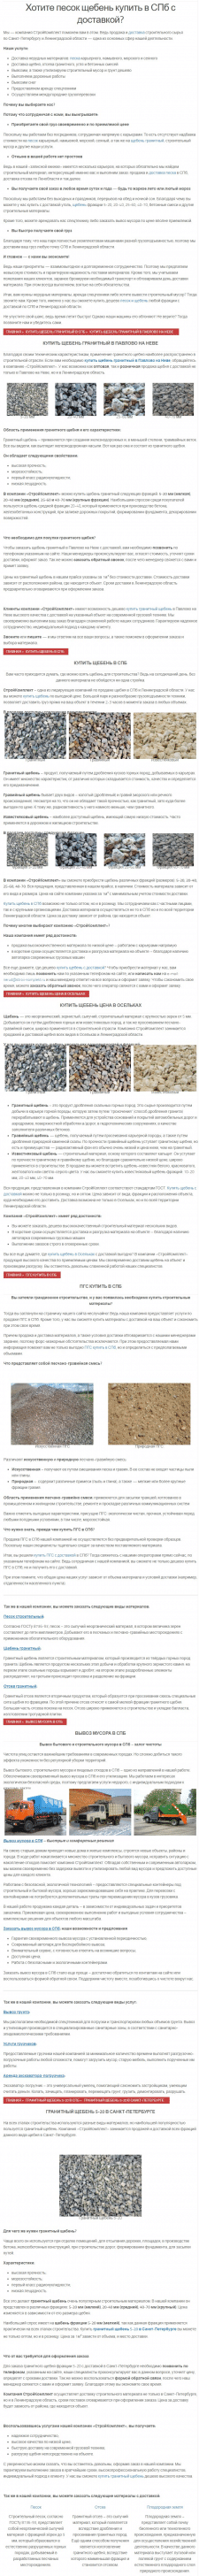 "НЕРУДНЫЕ МАТЕРИАЛЫ и мусор ""СтройКомплект"""